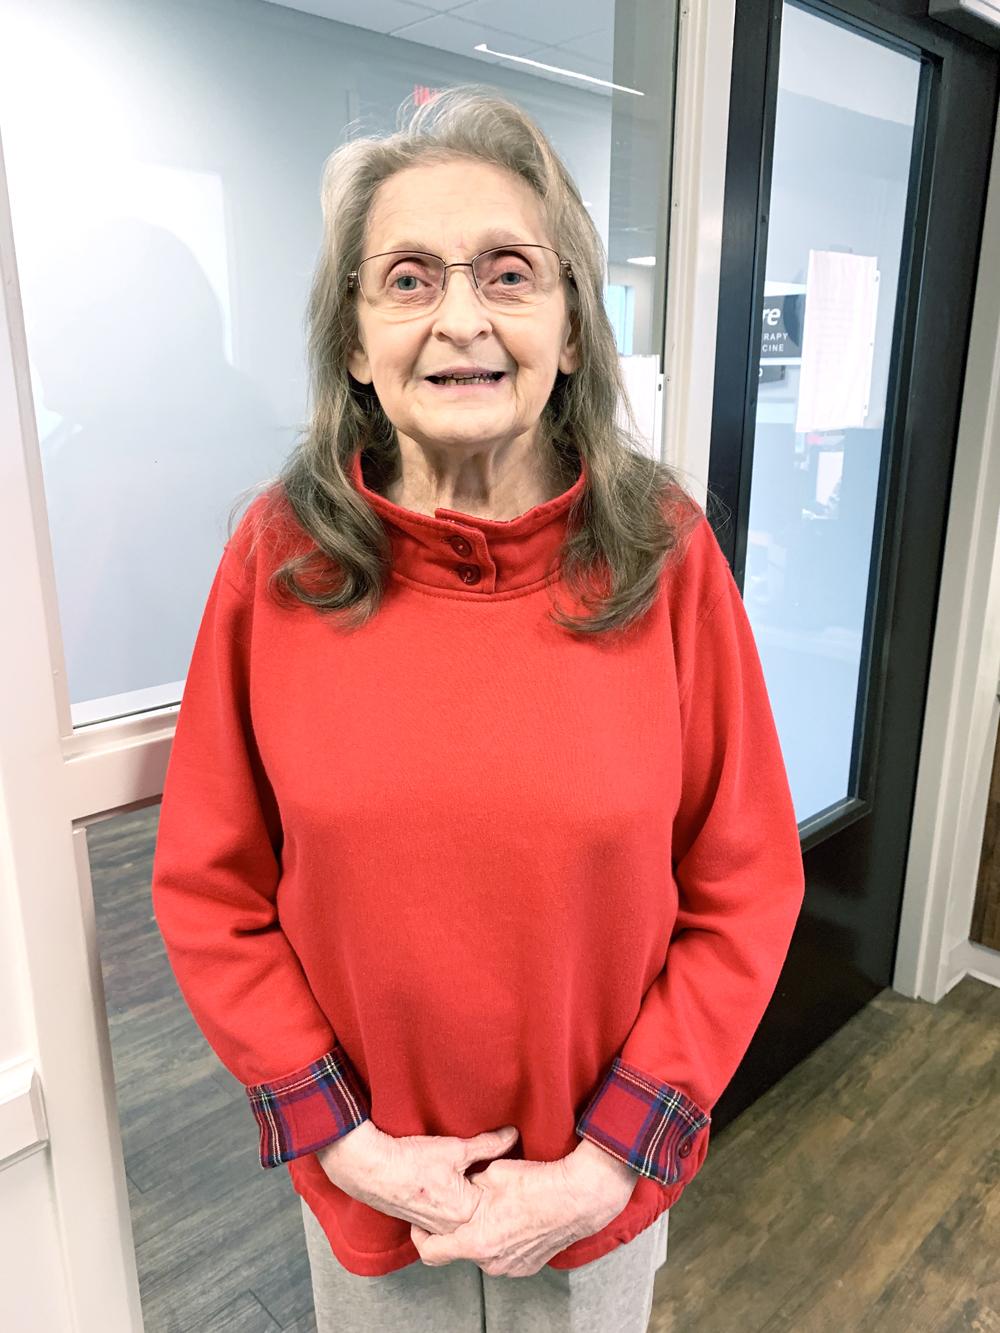 Carol Snarski is Patient of the Month for #EncoreRehab Foley #weLOVEtoseeyoumove